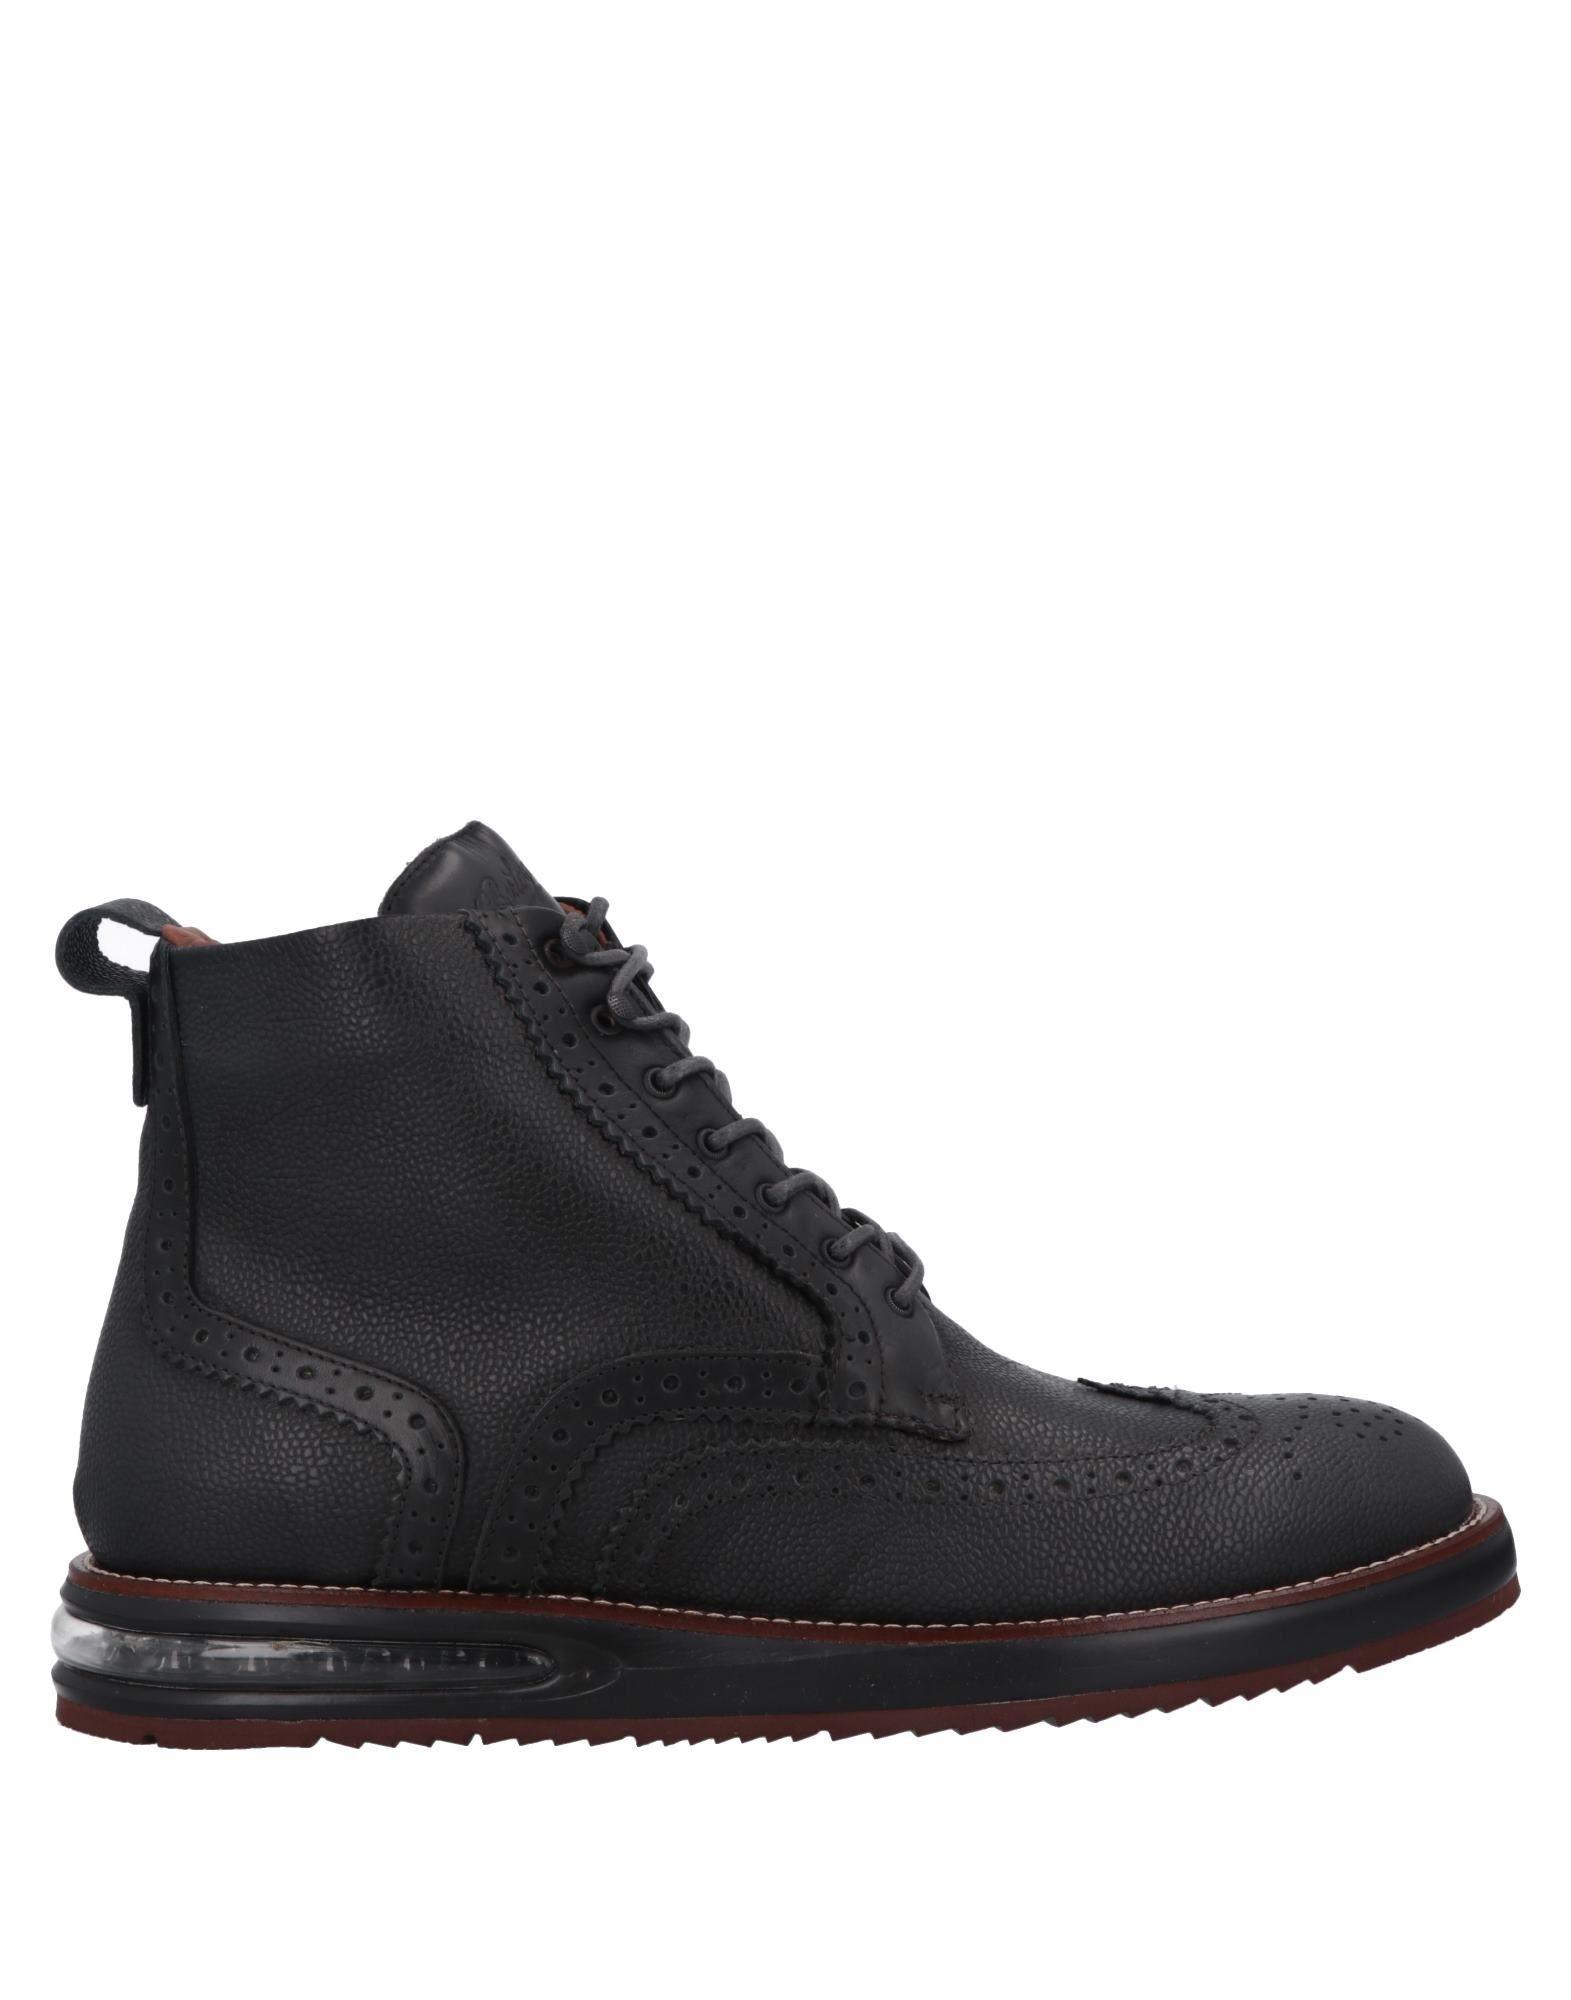 outlet store d7091 ecc6a BARLEYCORN ANKLE BOOTS. #barleycorn #shoes | Barleycorn ...